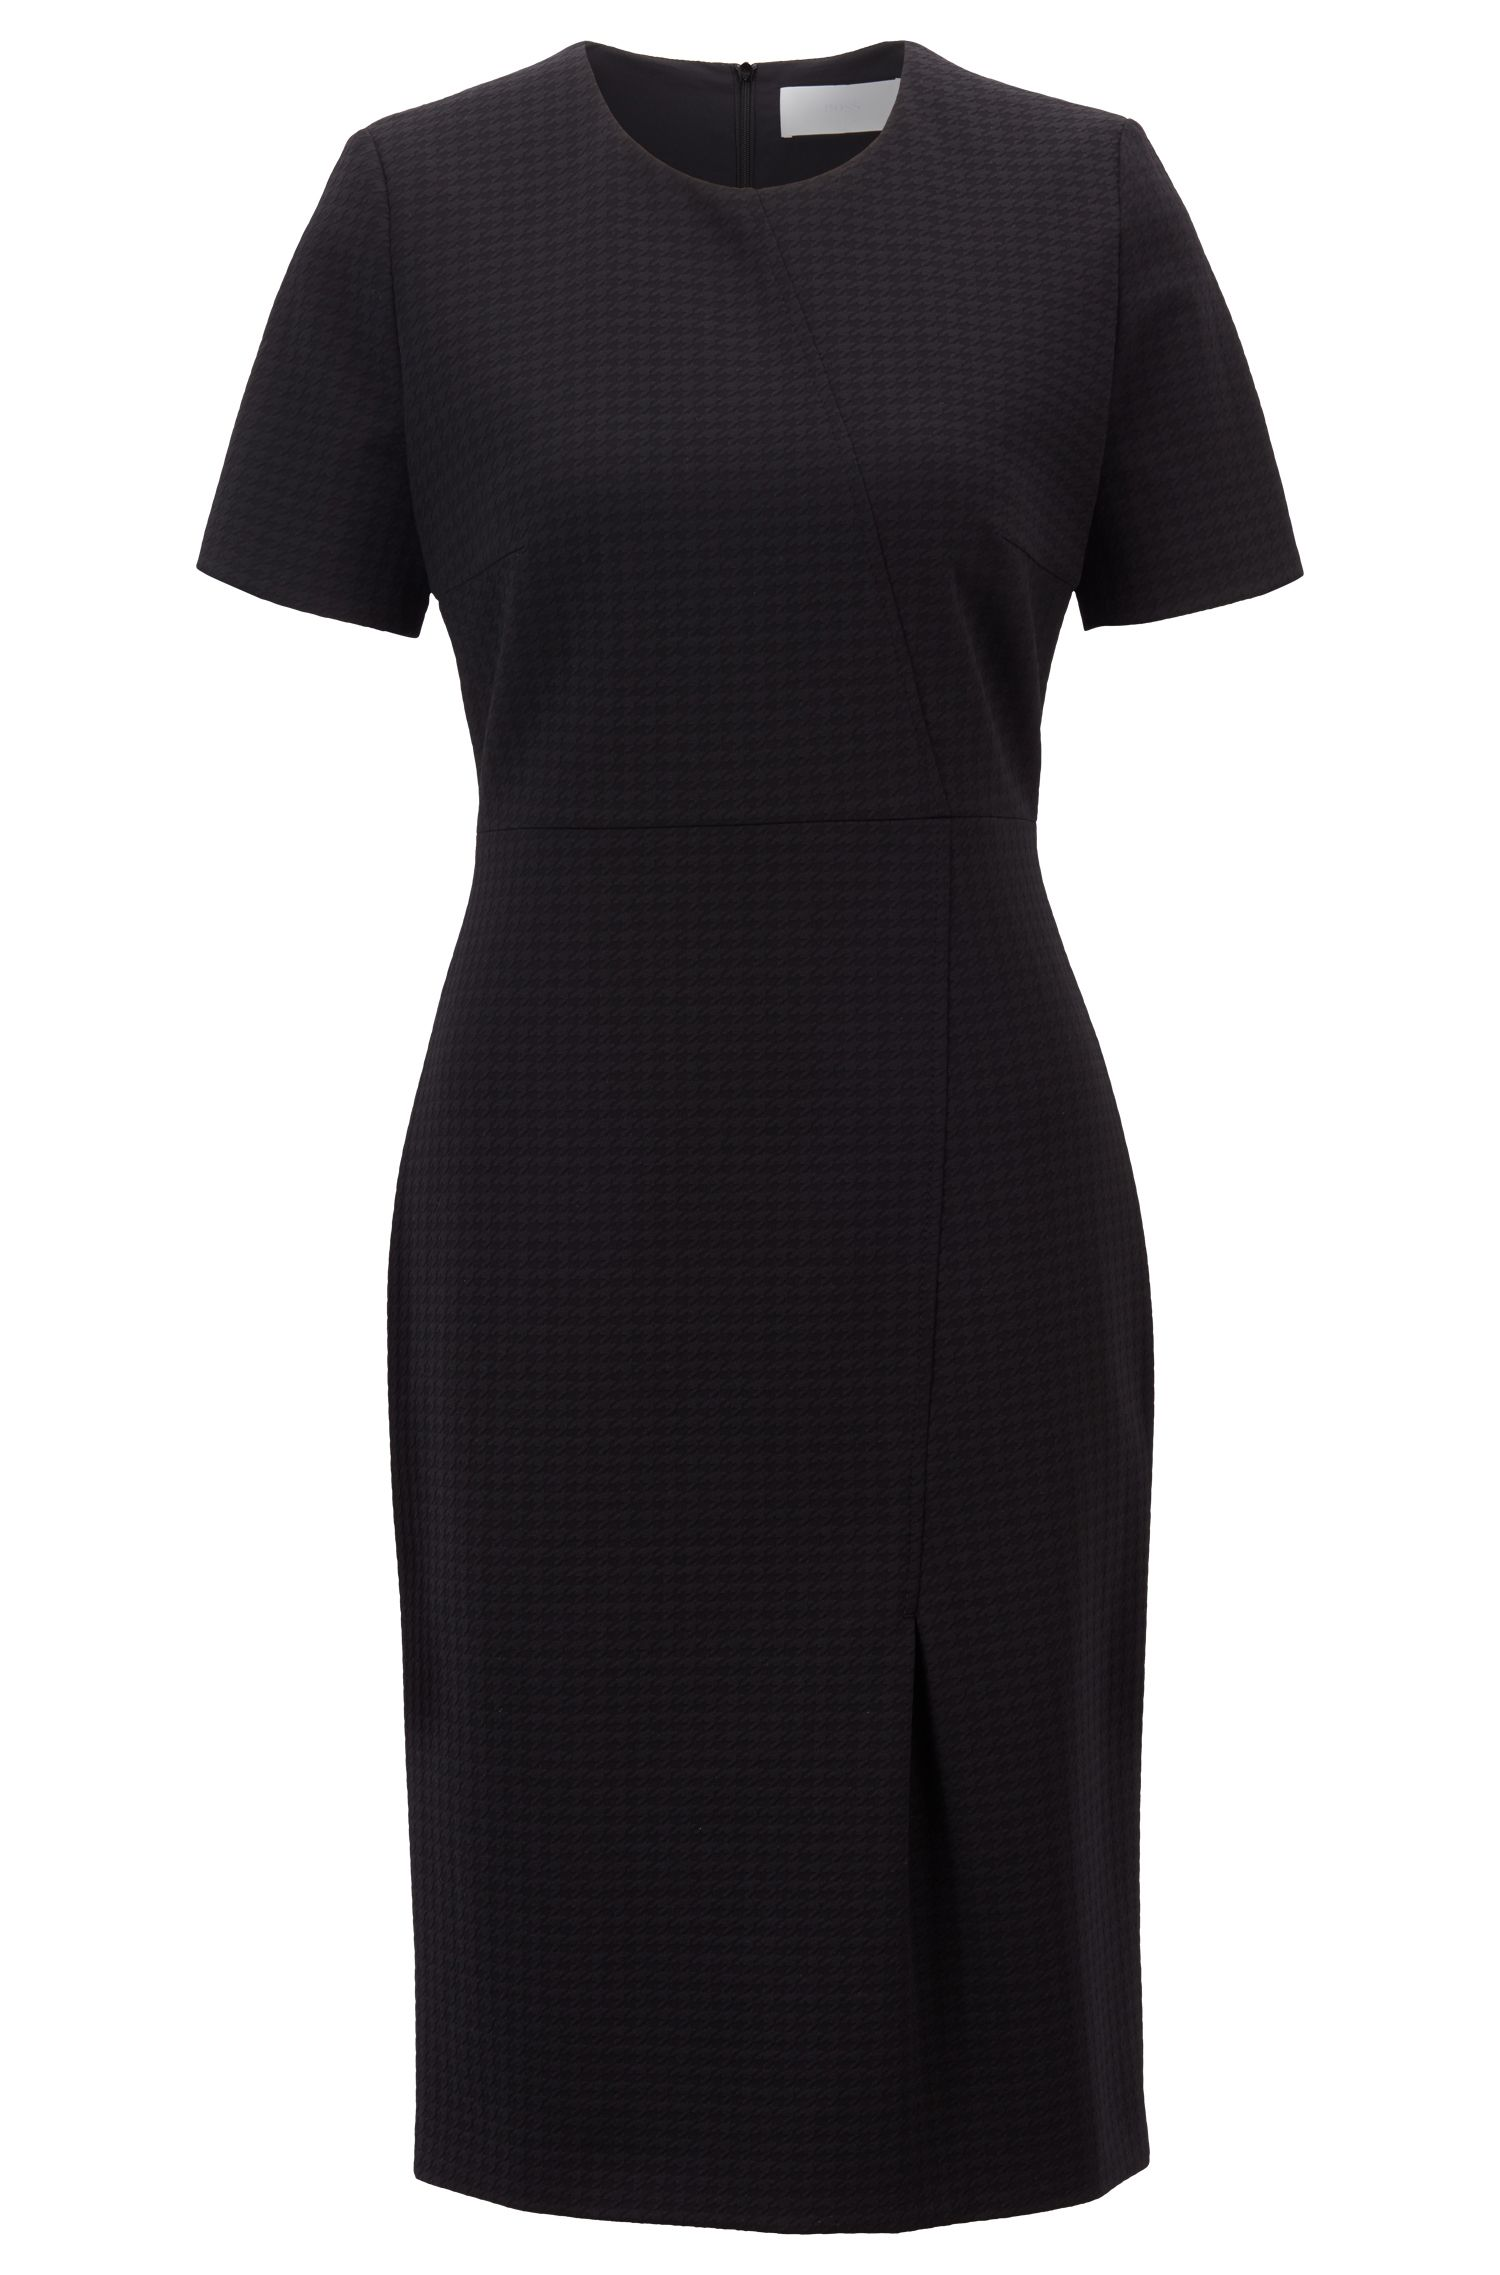 Short-sleeved dress in Italian houndstooth jersey, Black